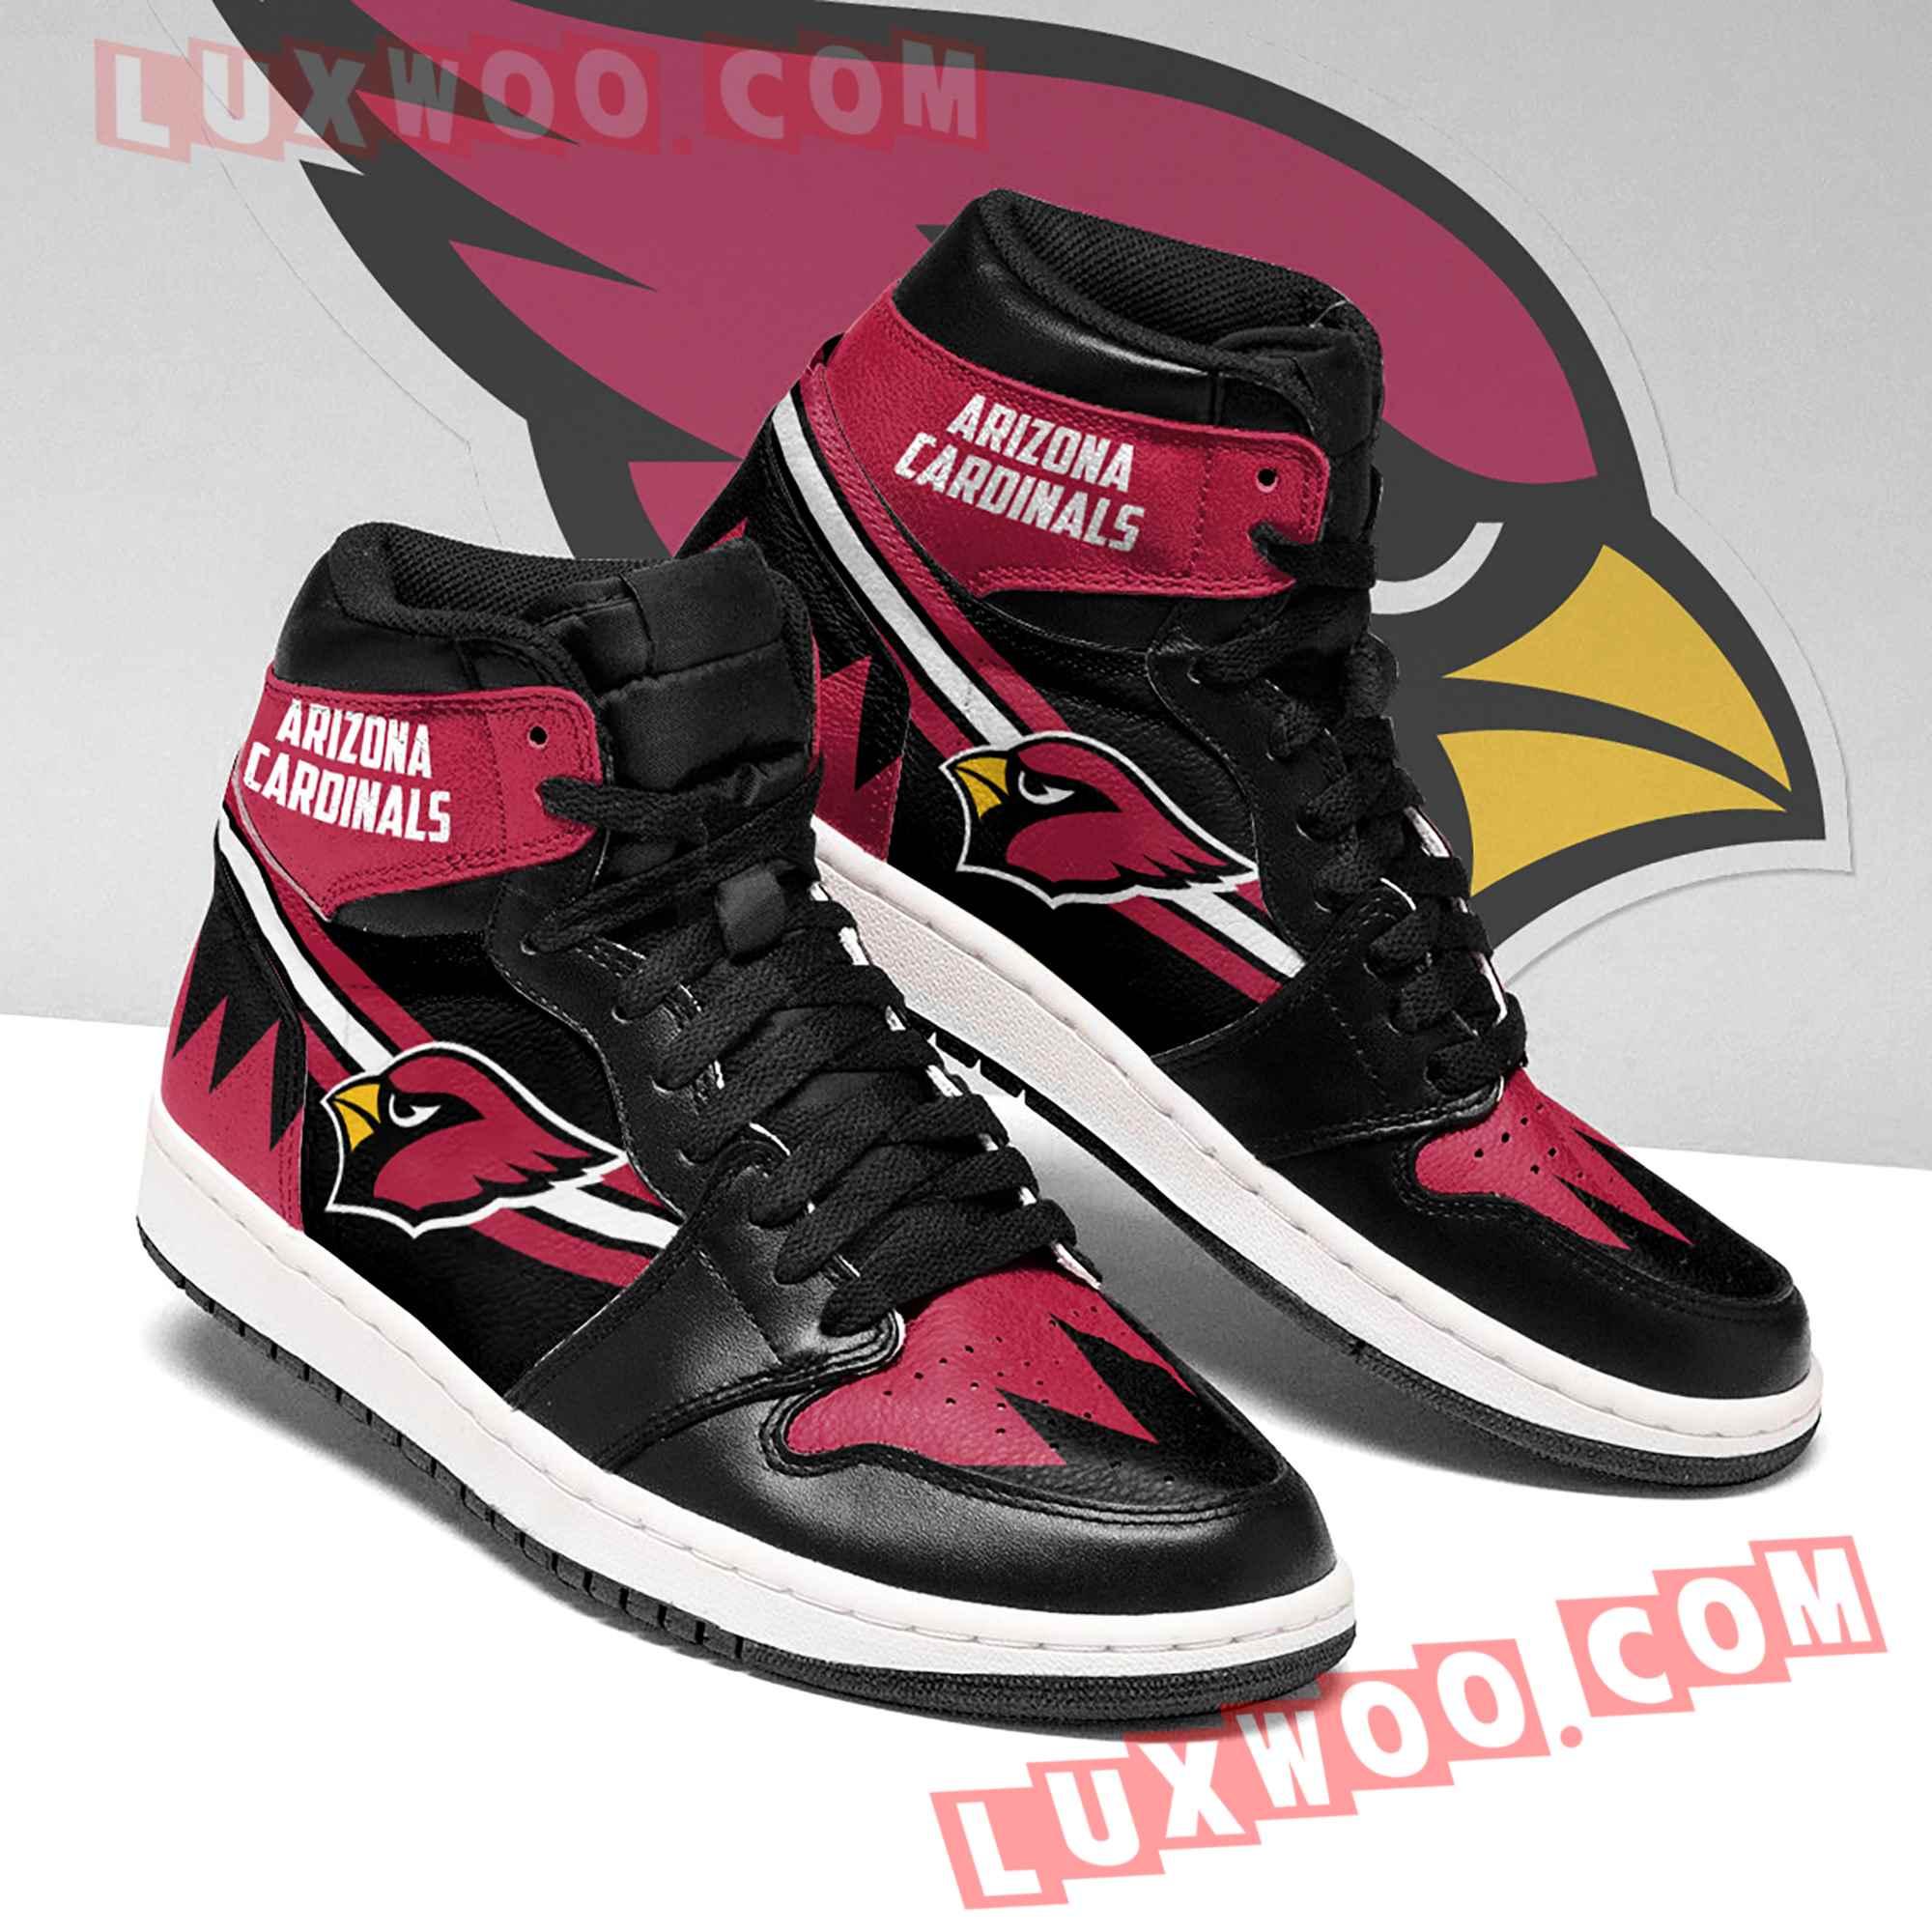 Arizona Cardinals Nfl Air Jordan 1 Custom Shoes Sneaker V5